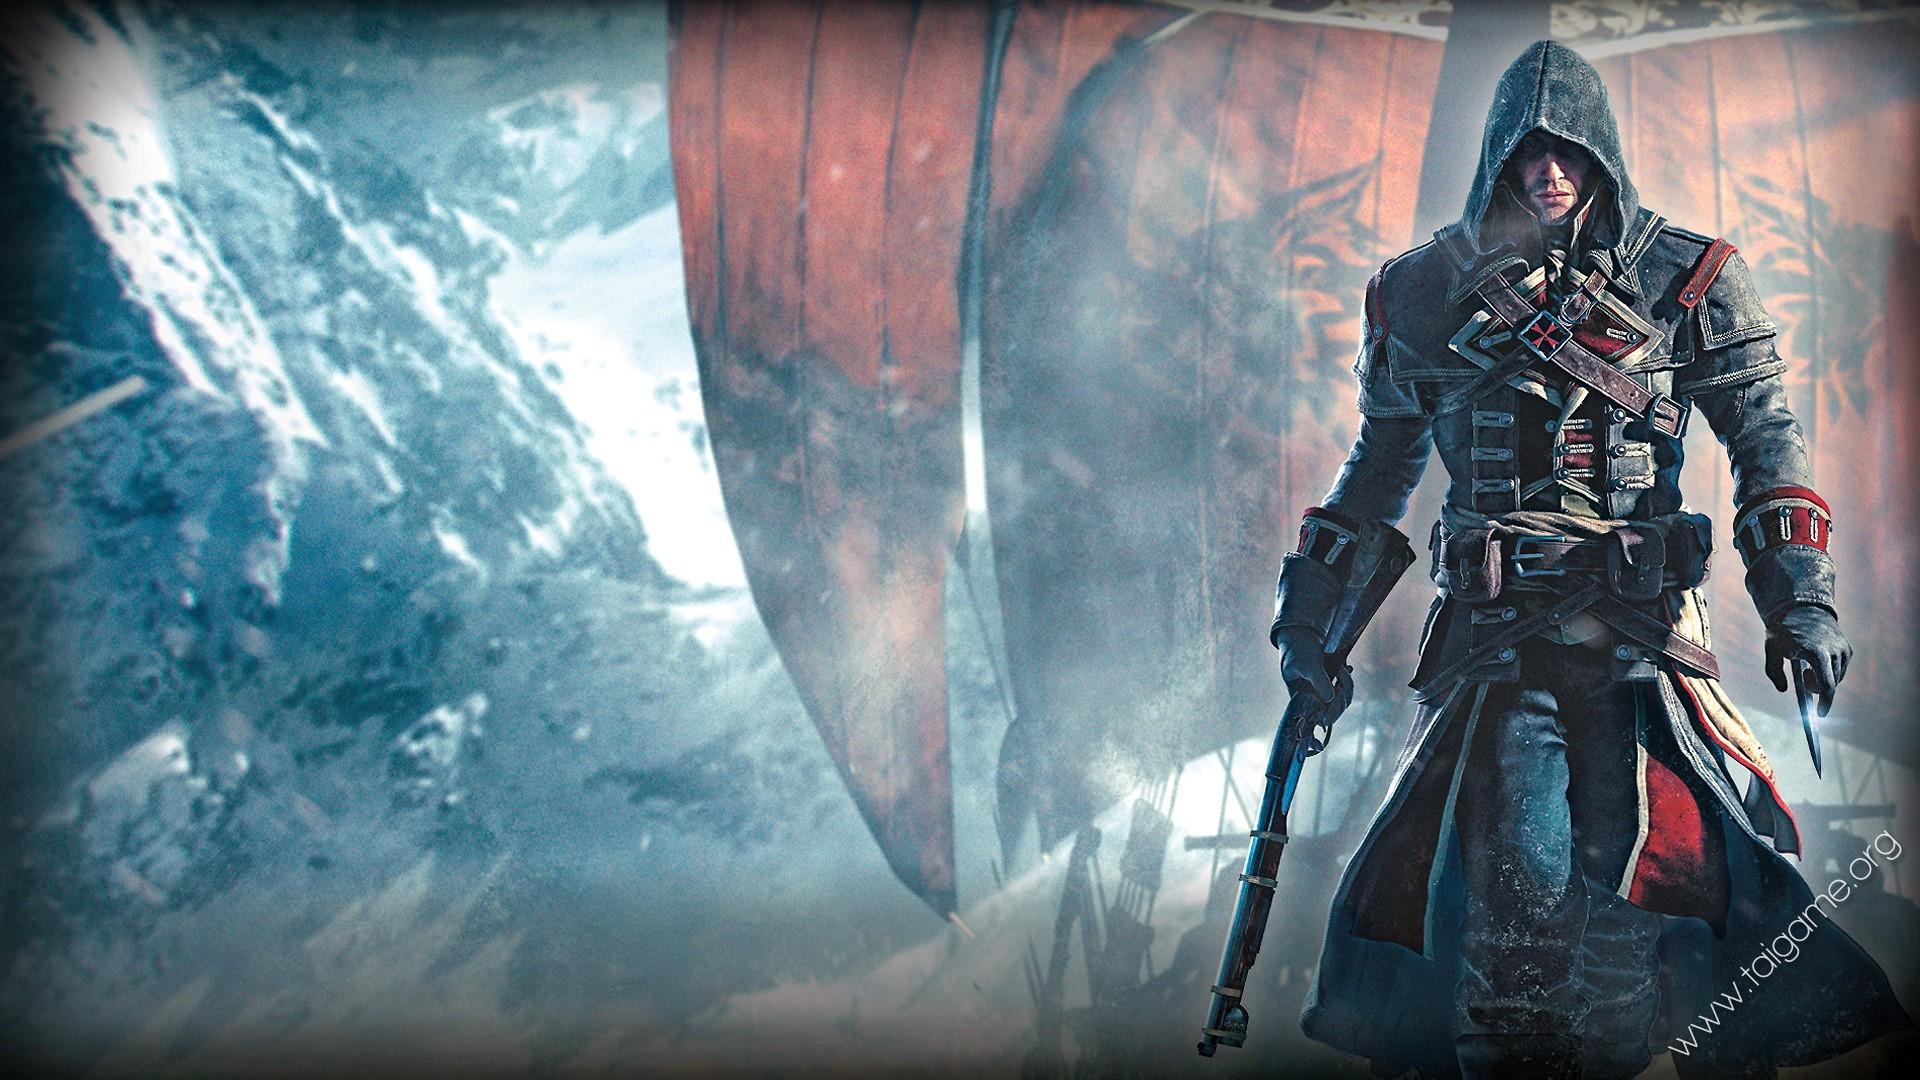 Assassins Creed Wallpaper 1080p: Assassin's Creed Rogue - Download Free Full Games